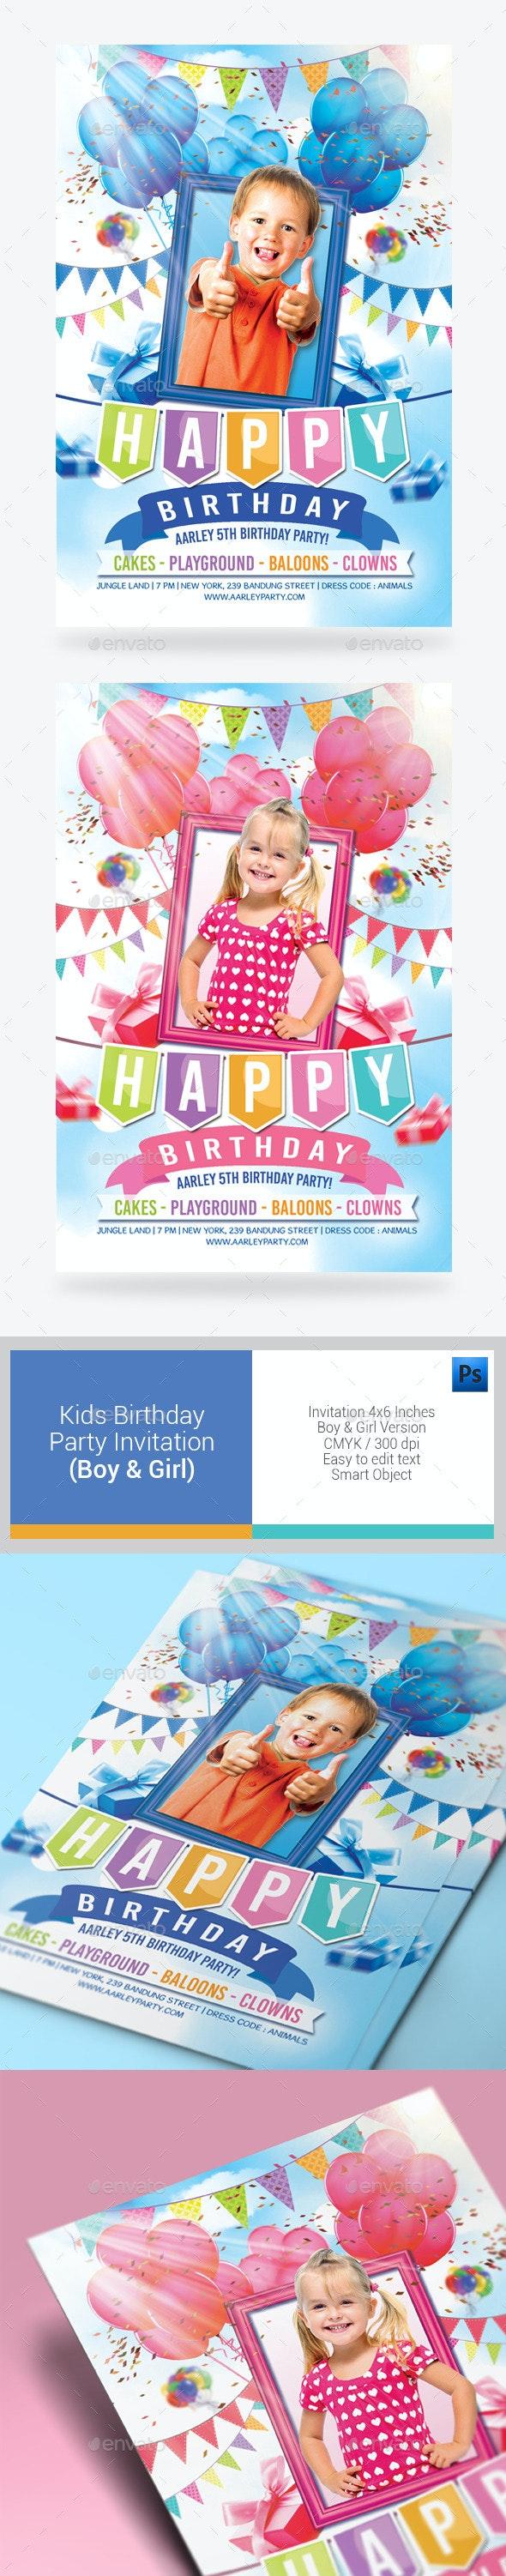 Kids Birthday Party Invitation ( Boy & Girl ) - Birthday Greeting Cards